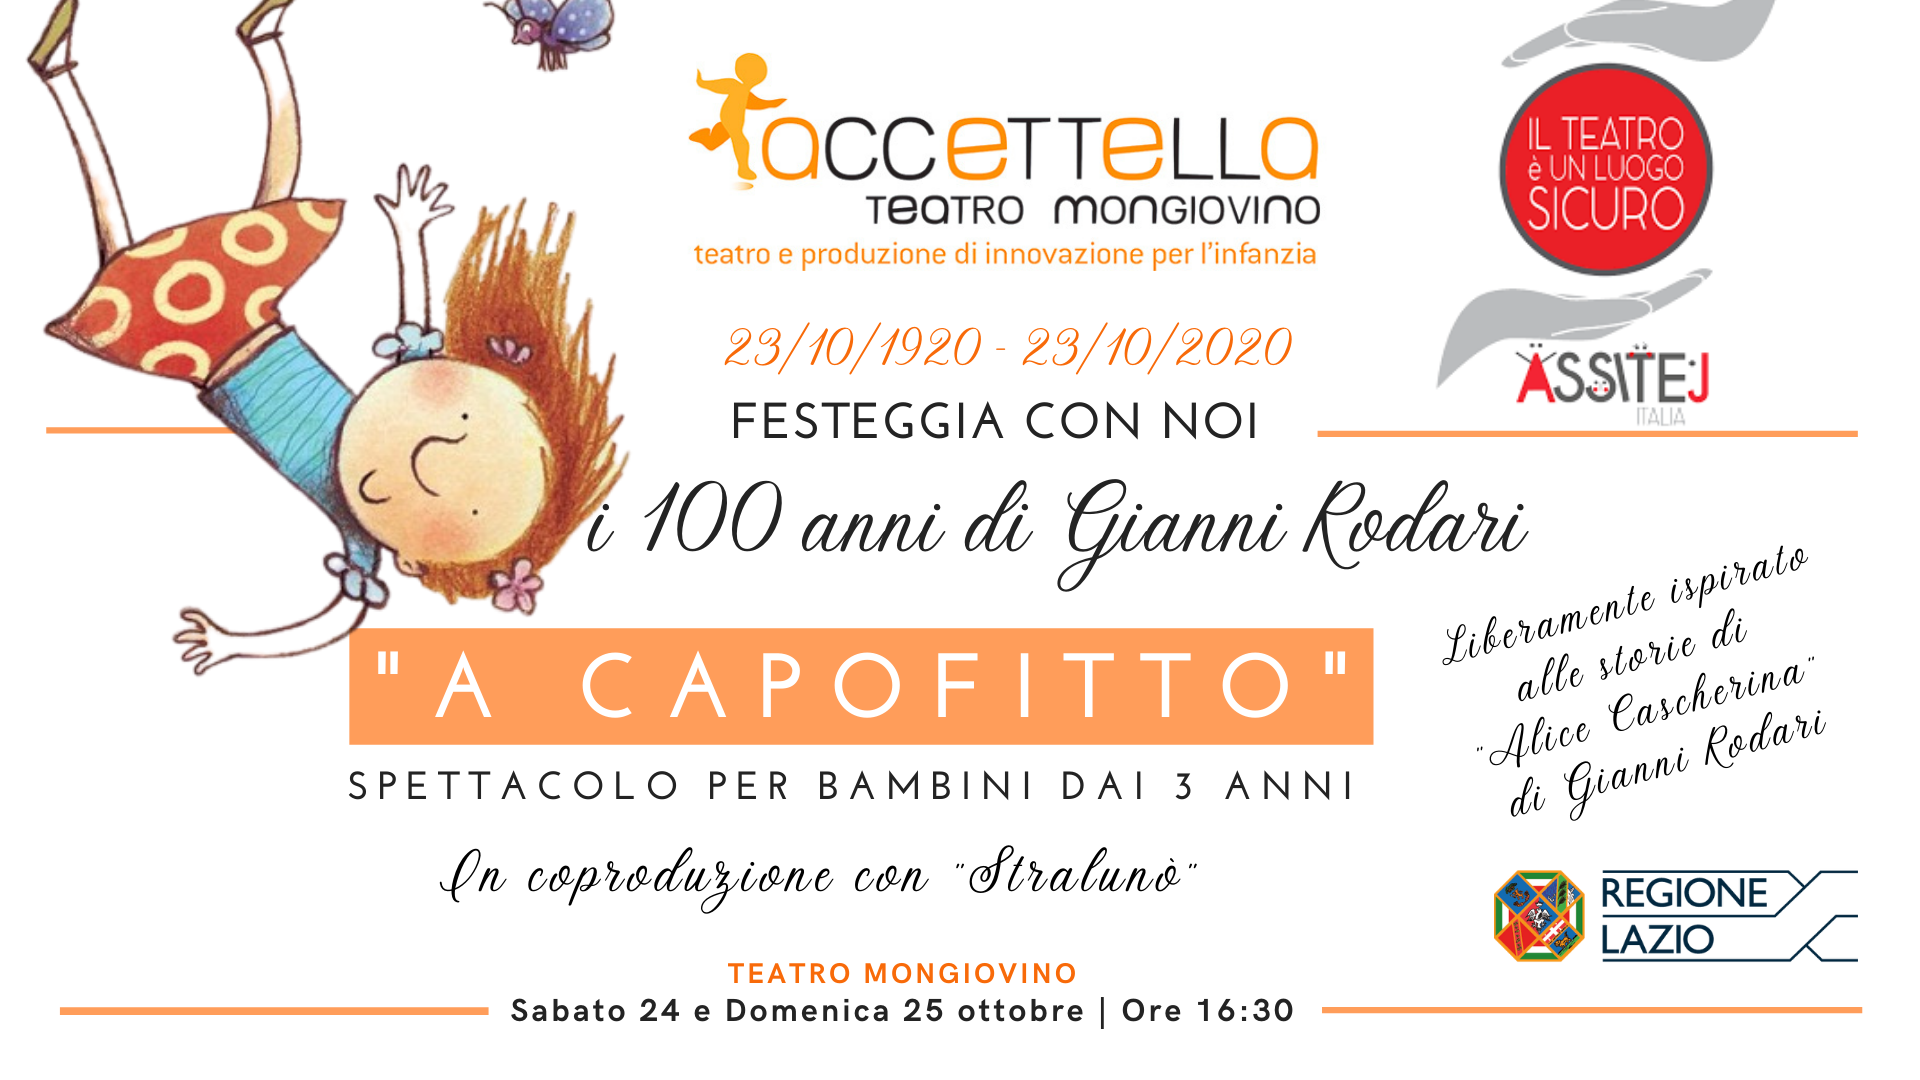 23 ottobre 1920 festeggia con noi i 100 anni di Gianni Rodari (1)